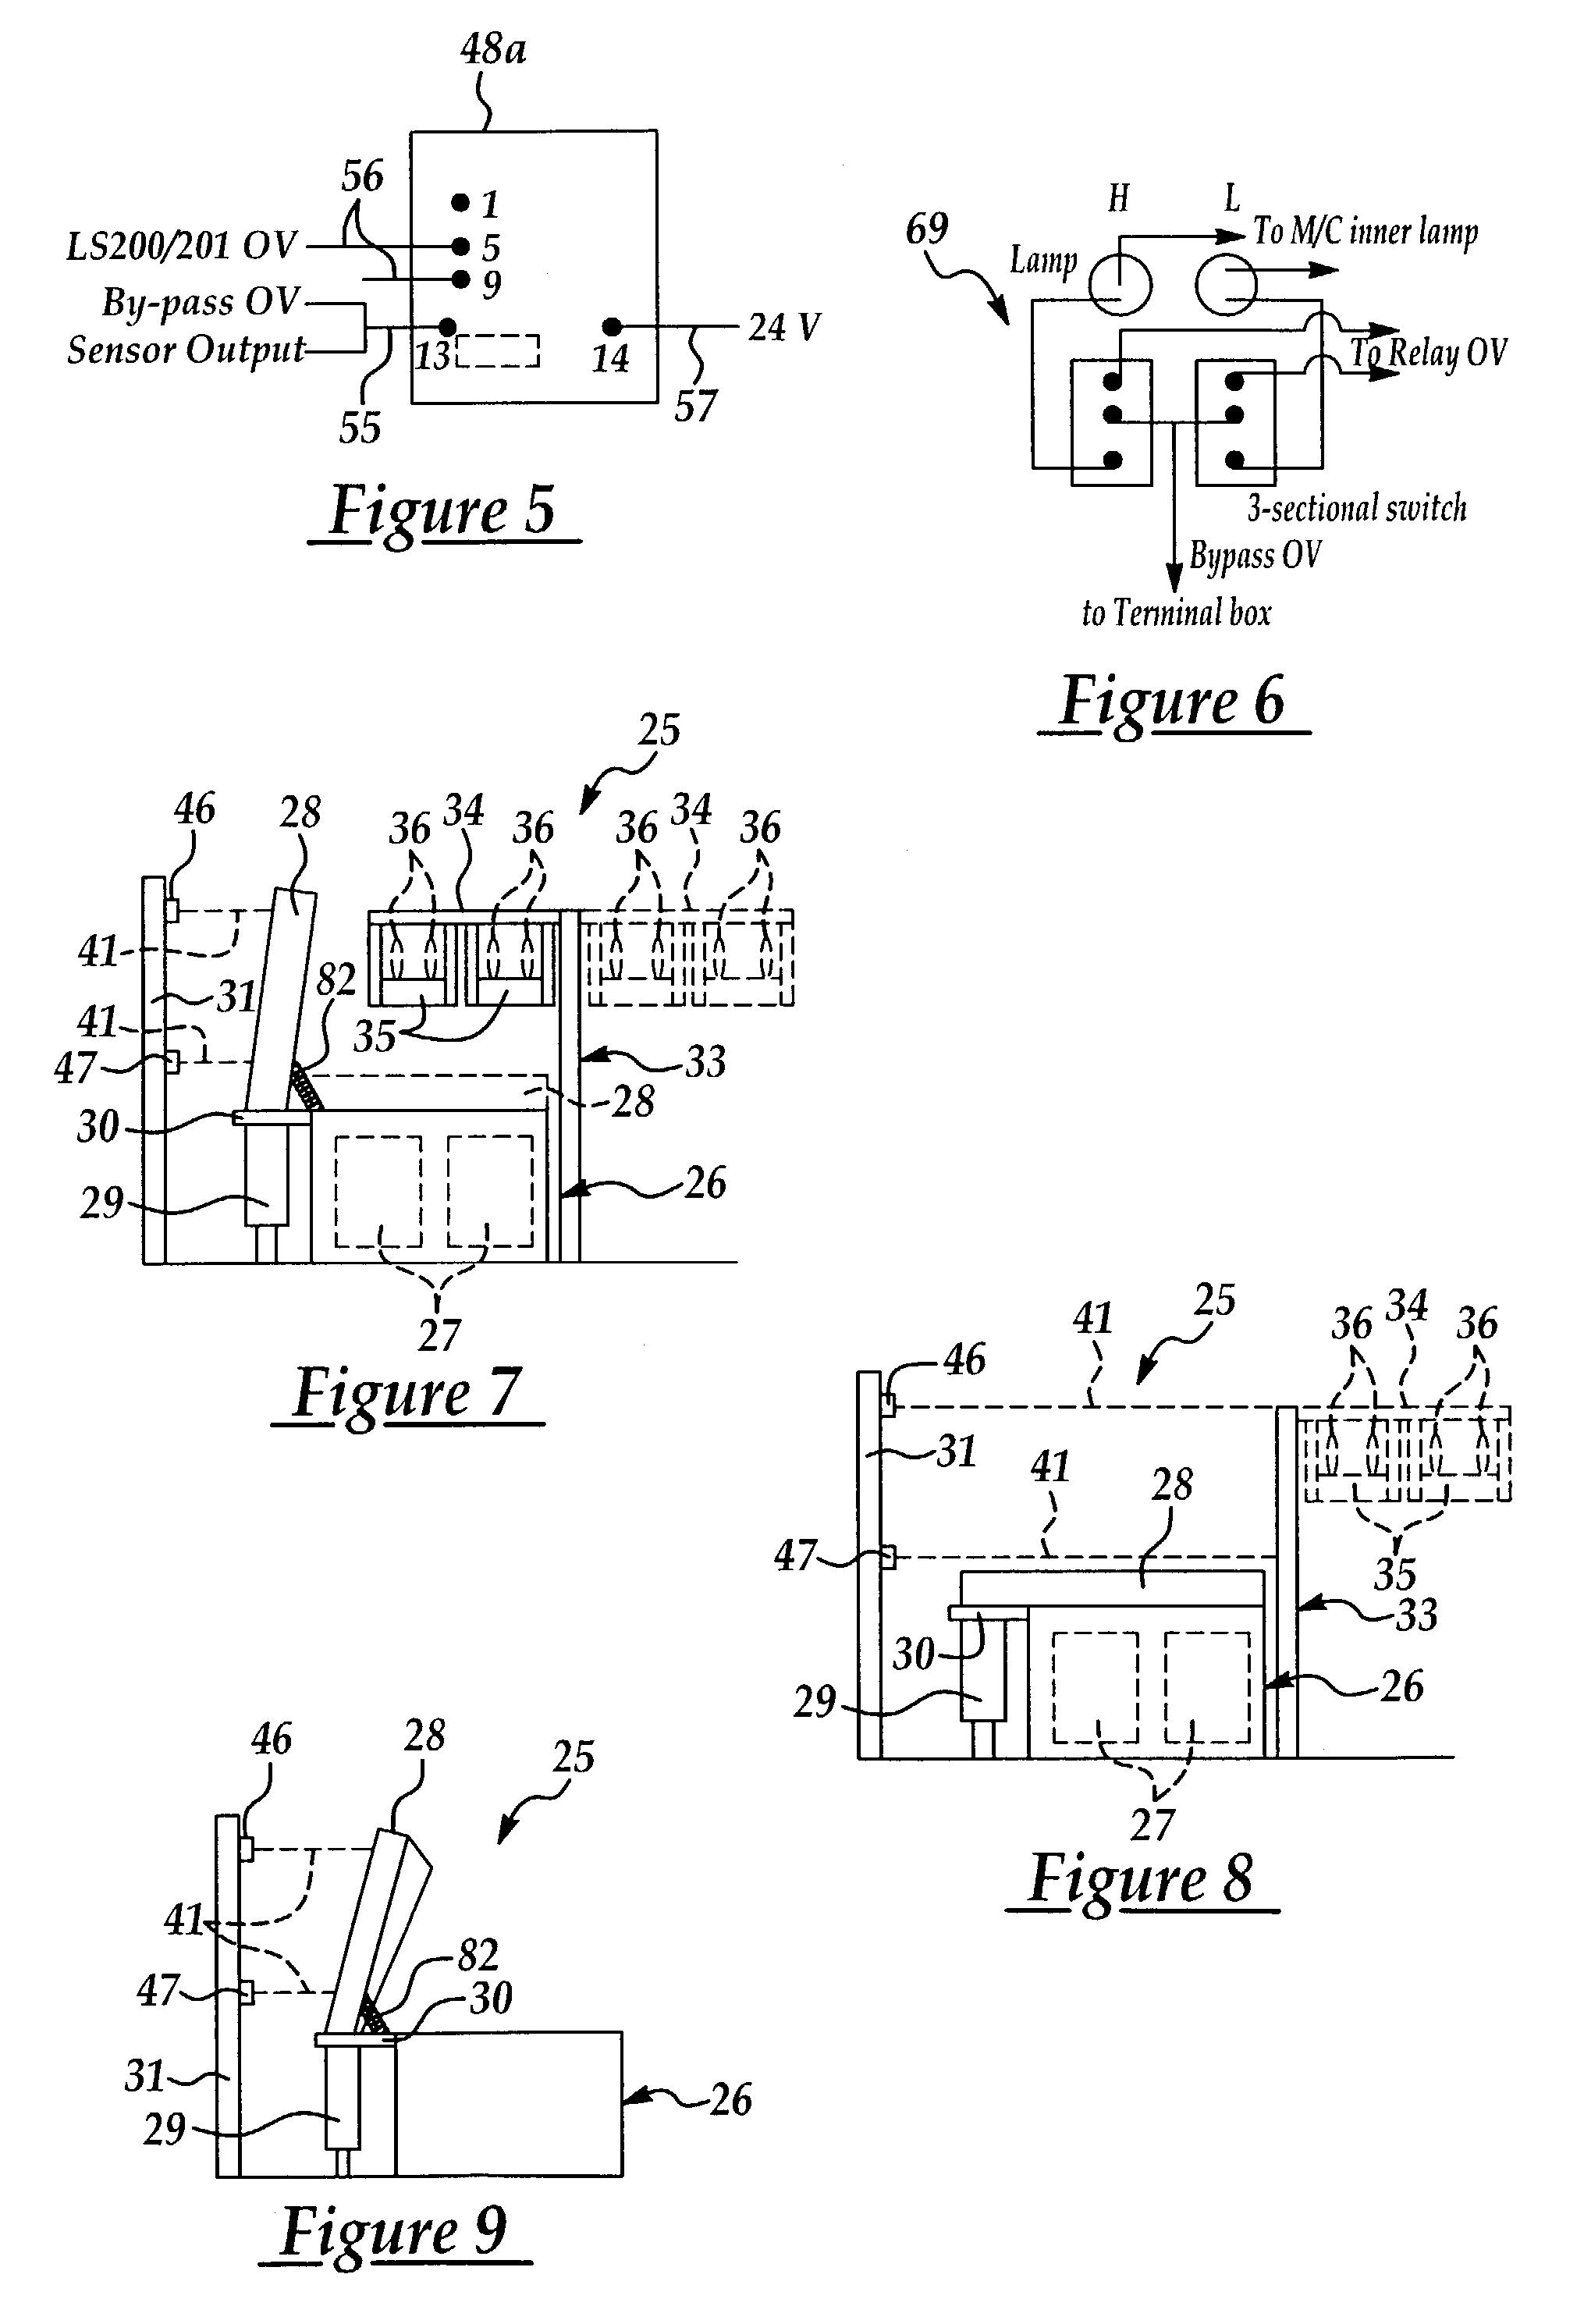 US07002134 20060221 D00002?resize=665%2C976 omron relay wiring diagram wiringdiagrams pilz pnoz s4 wiring diagram at bakdesigns.co